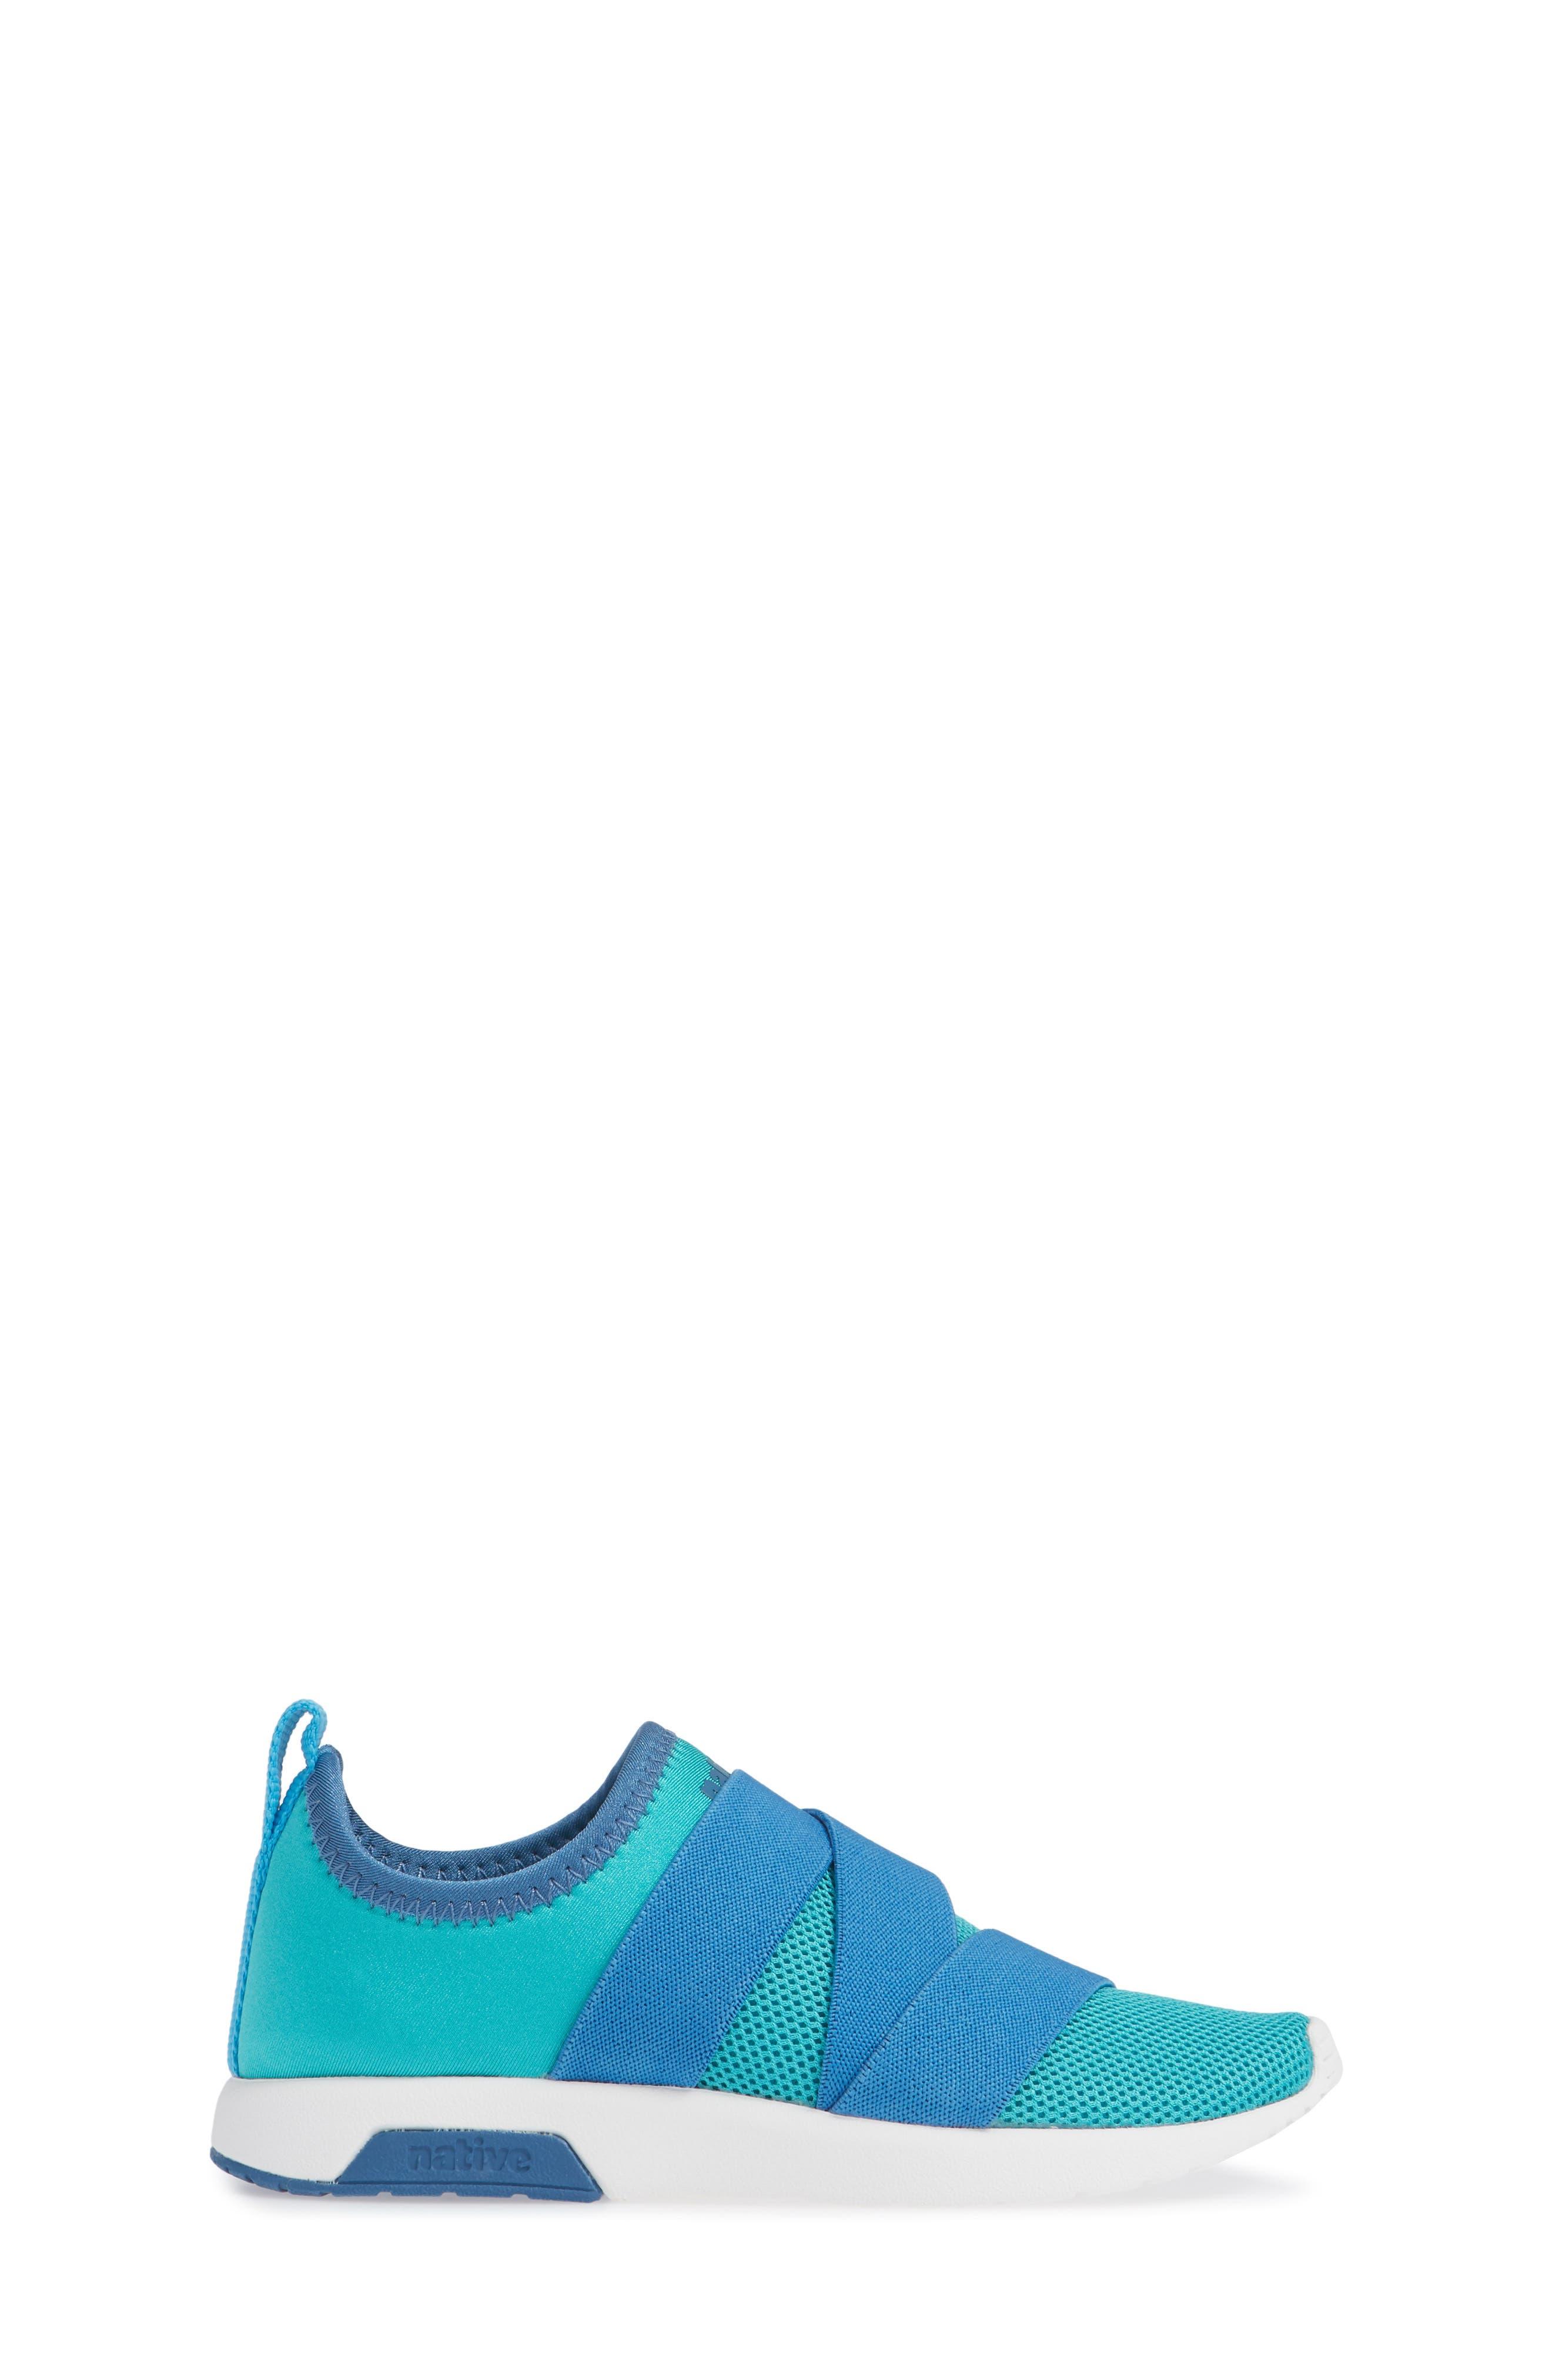 NATIVE SHOES,                             Phoenix Slip-On Vegan Sneaker,                             Alternate thumbnail 3, color,                             GLACIER GREEN/ BLUE/ WHITE